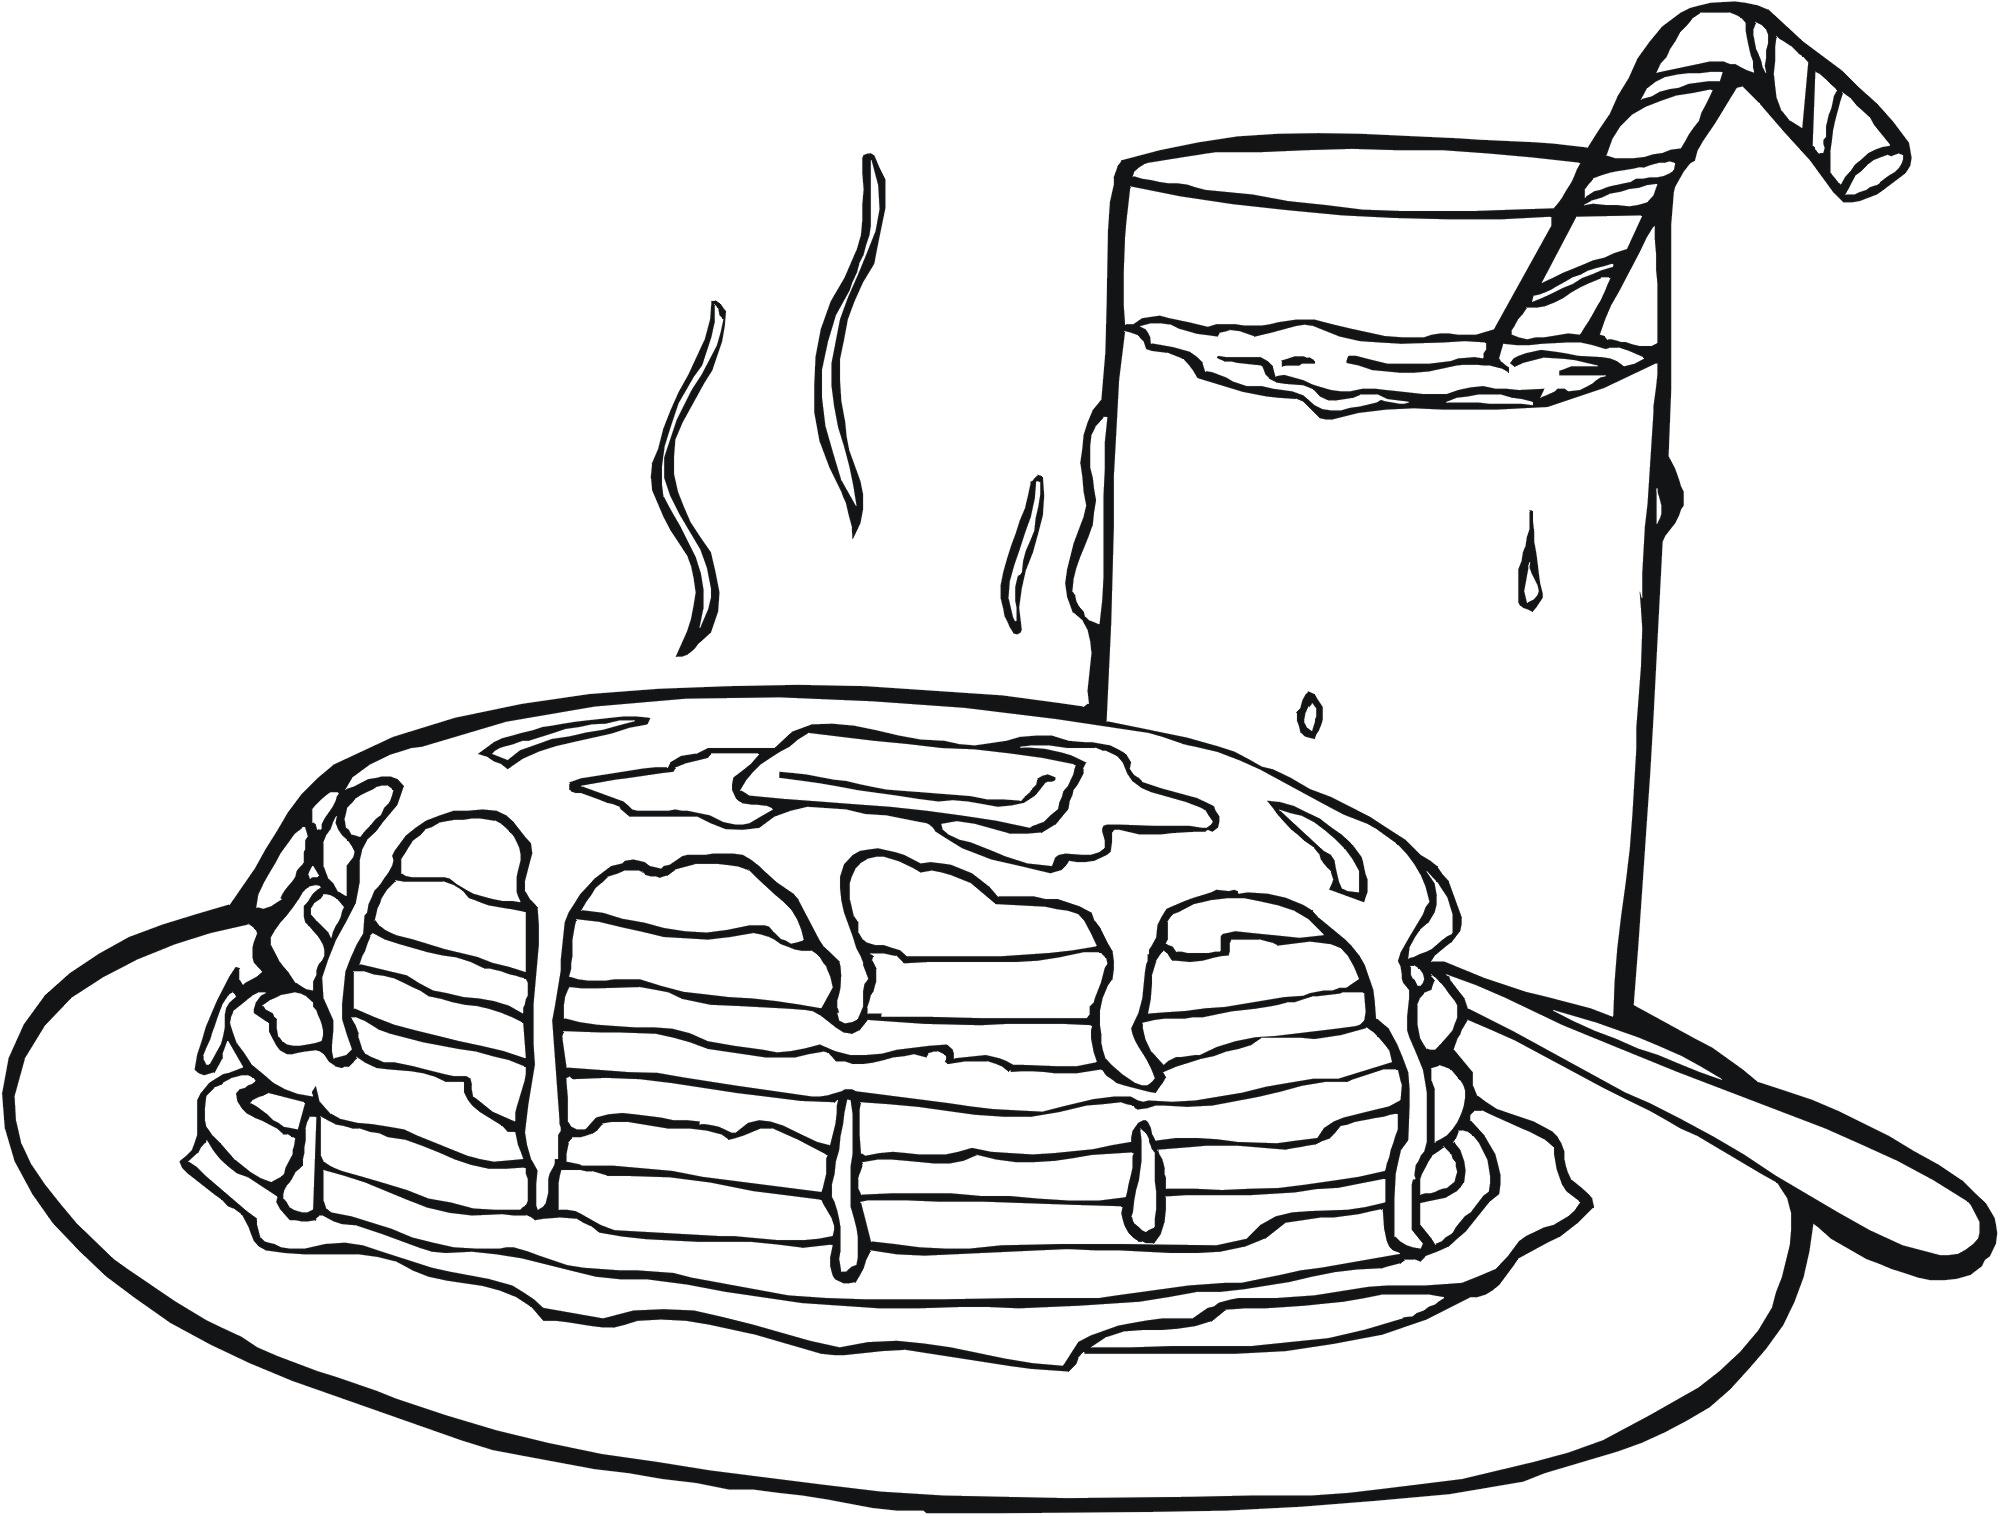 2000x1516 Pamela Pancake Shopkin Coloring Page Free Printable Pages Within